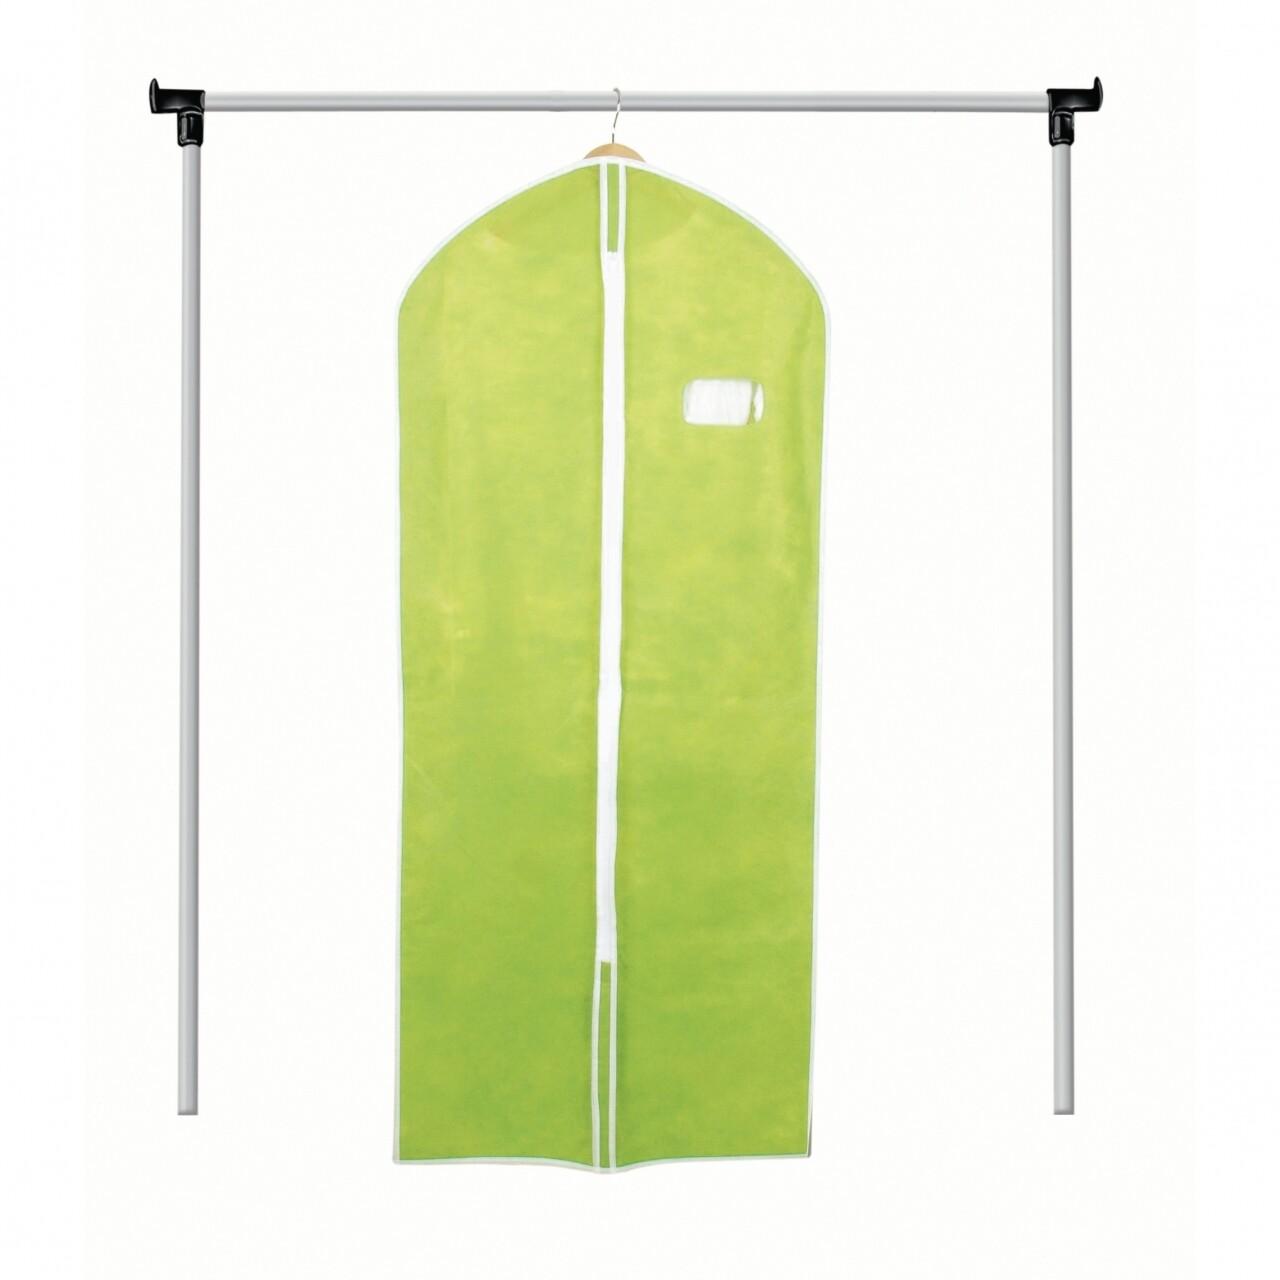 Husa pentru haine Green, Jocca, 60x134 cm, polipropilena, verde